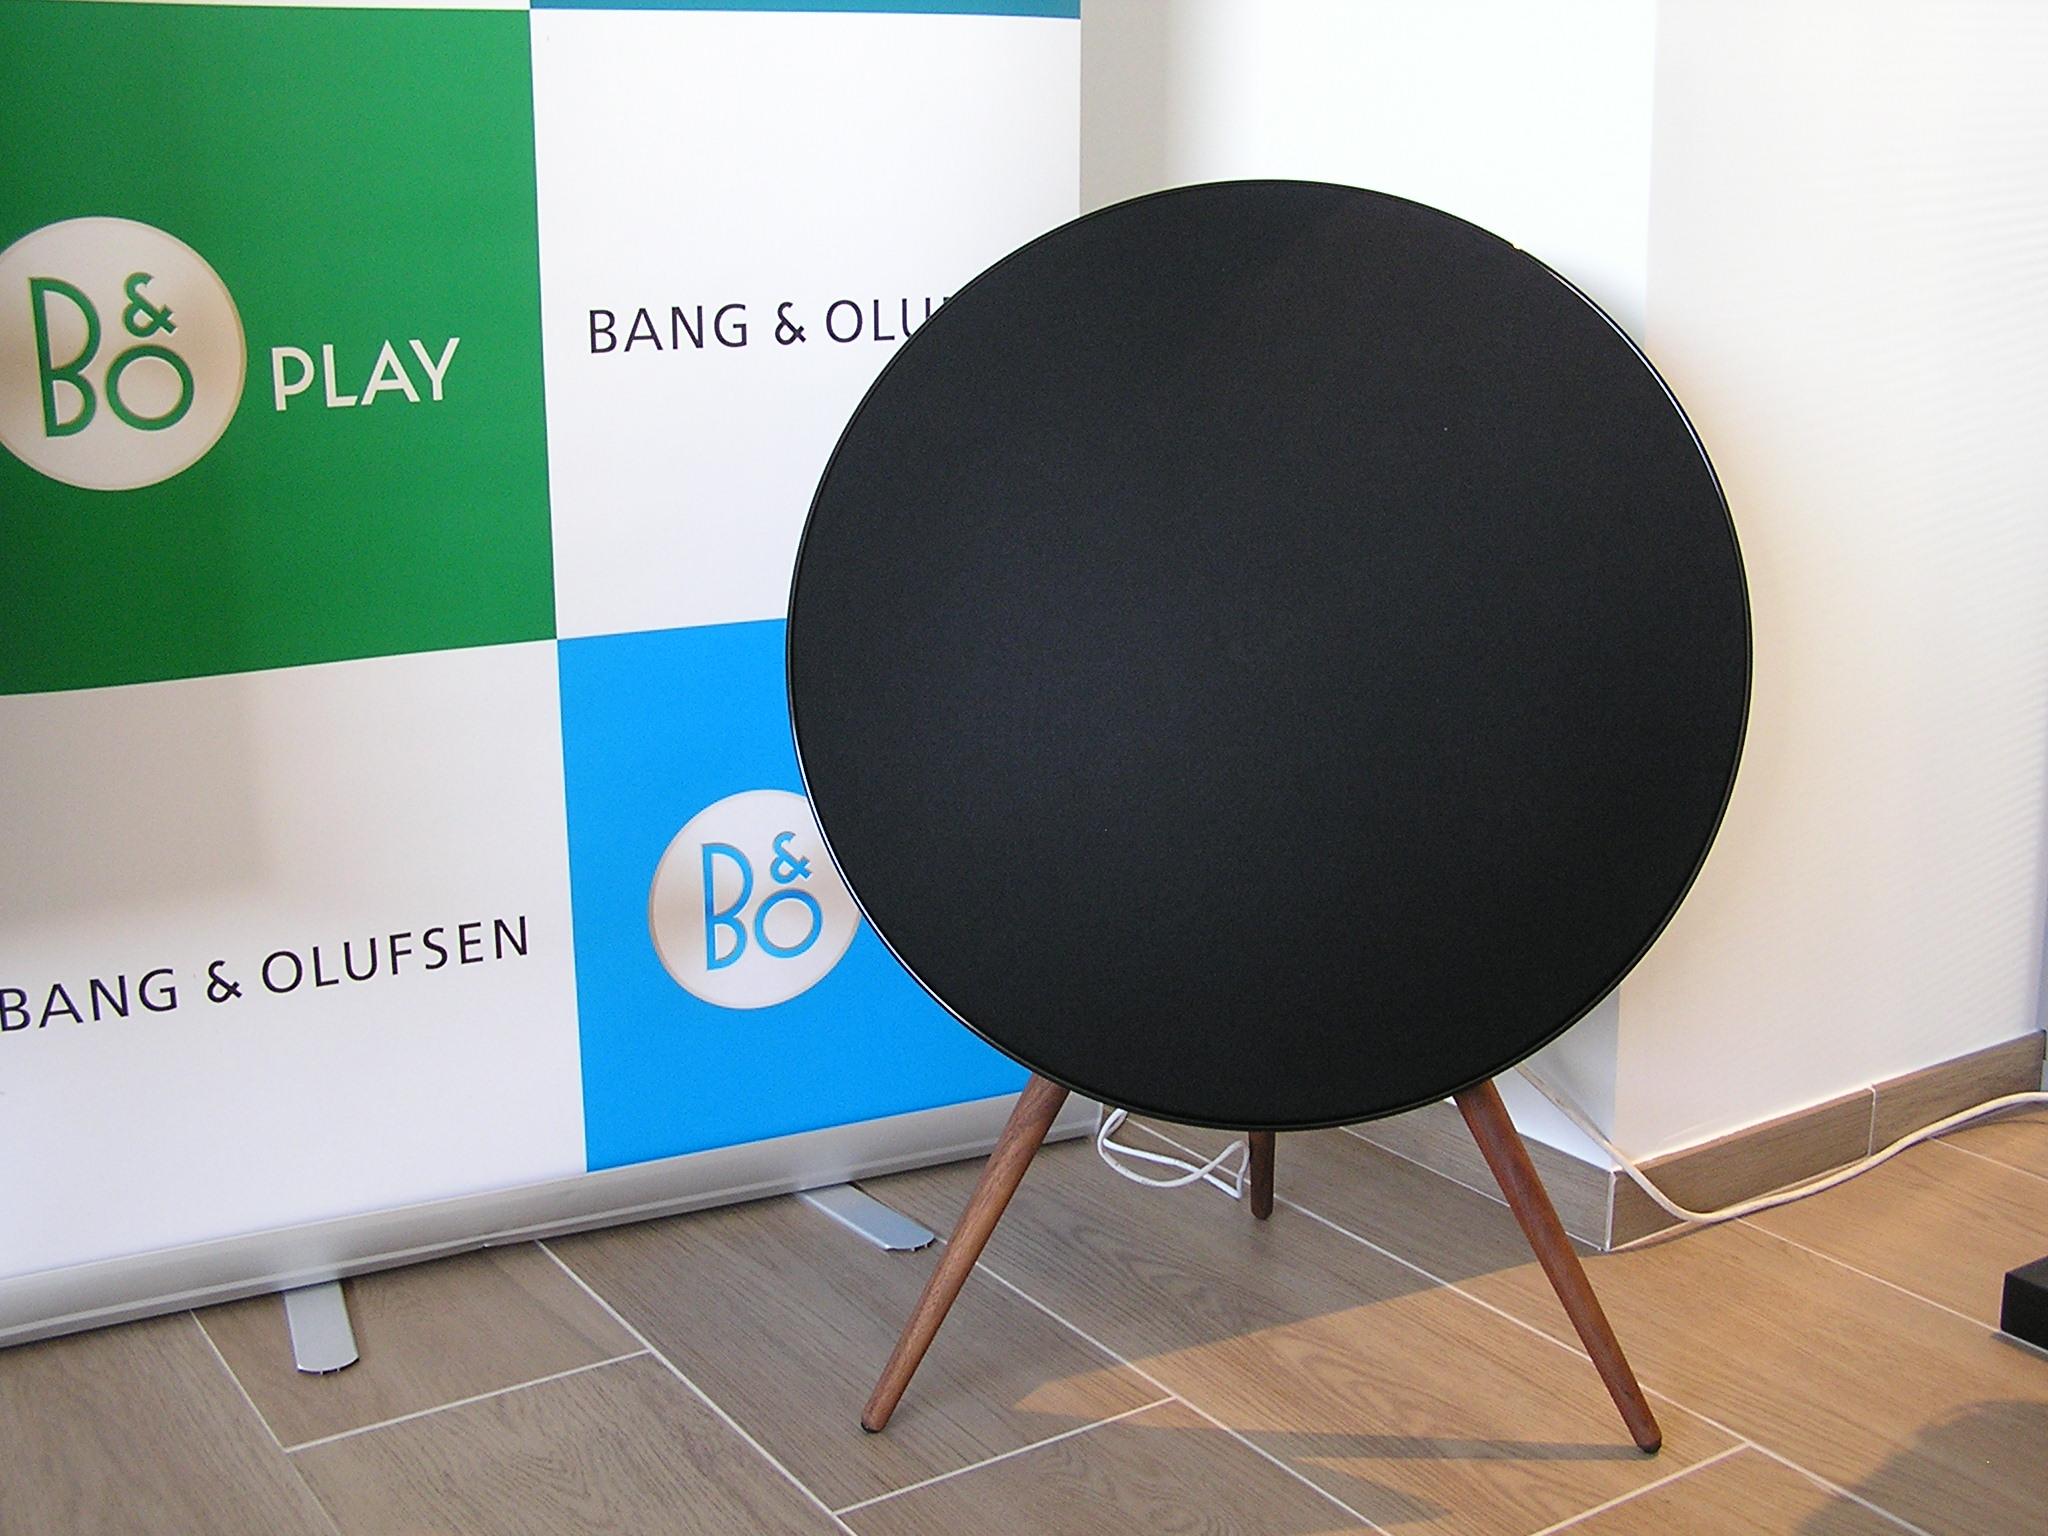 ENCEINTE SANS FIL HI-FI B&O Play A9